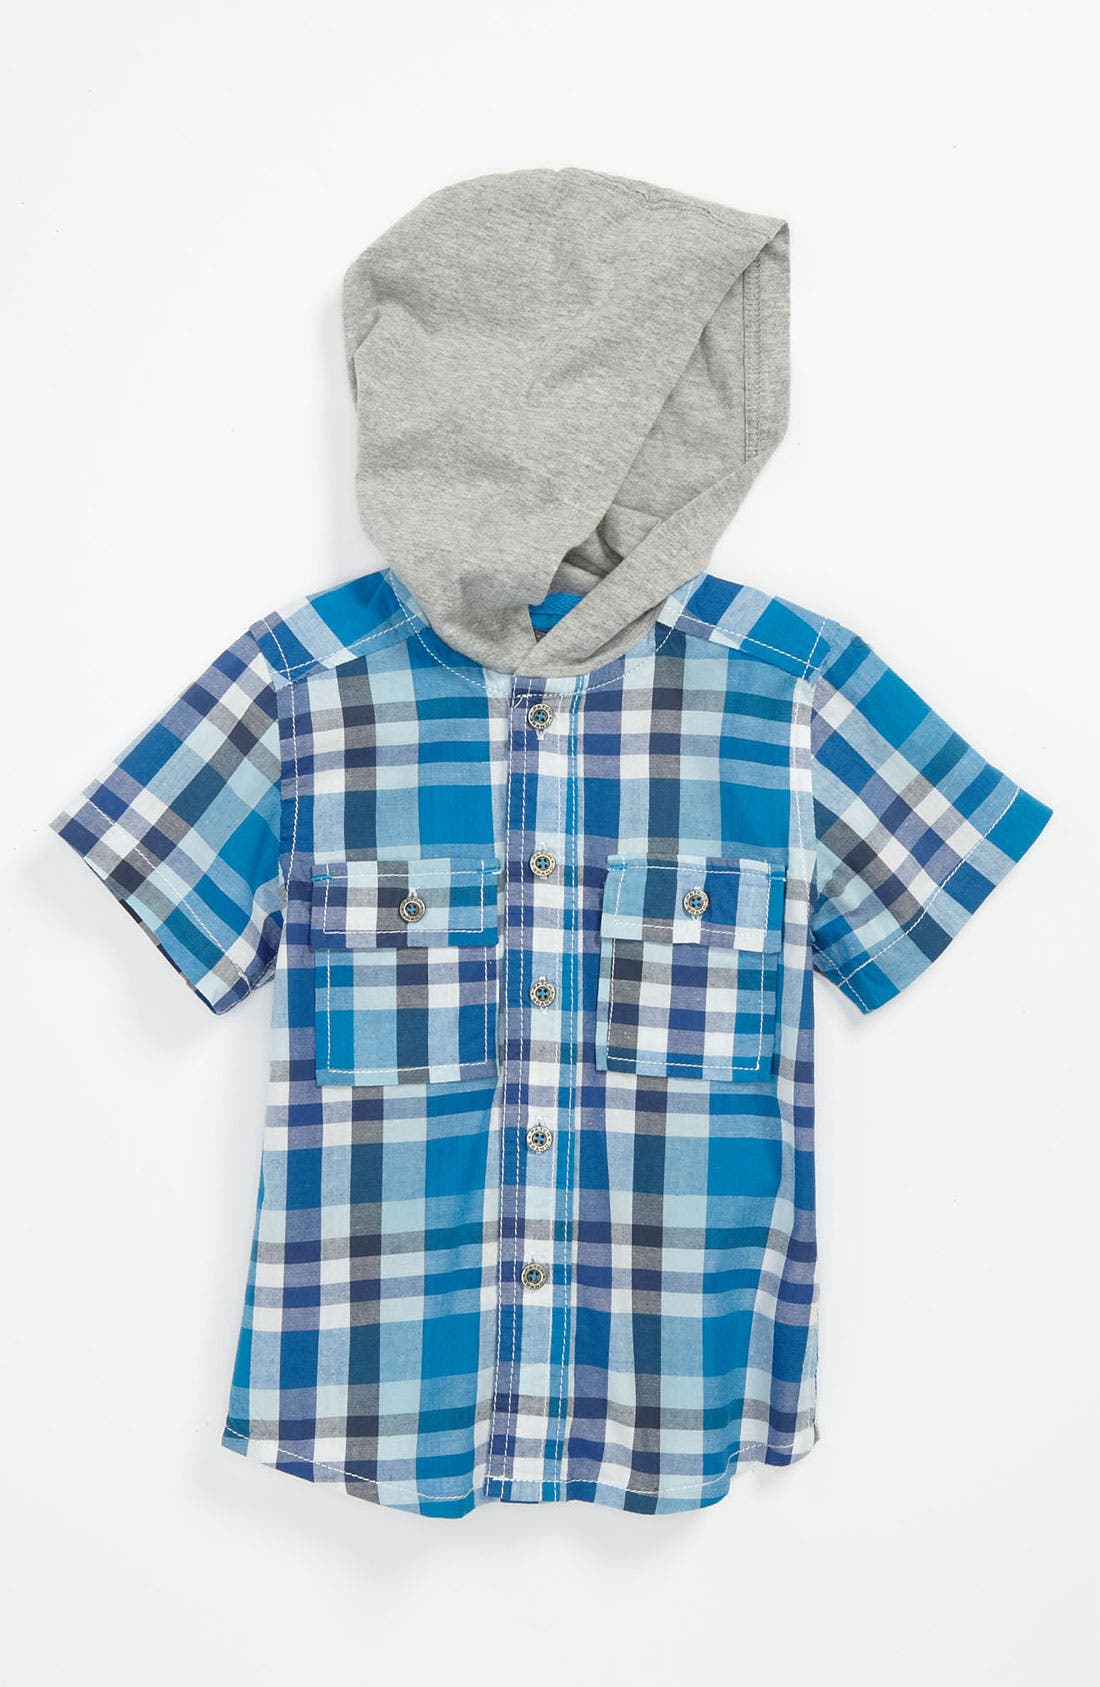 Main Image - Pumpkin Patch Hooded Shirt (Baby)